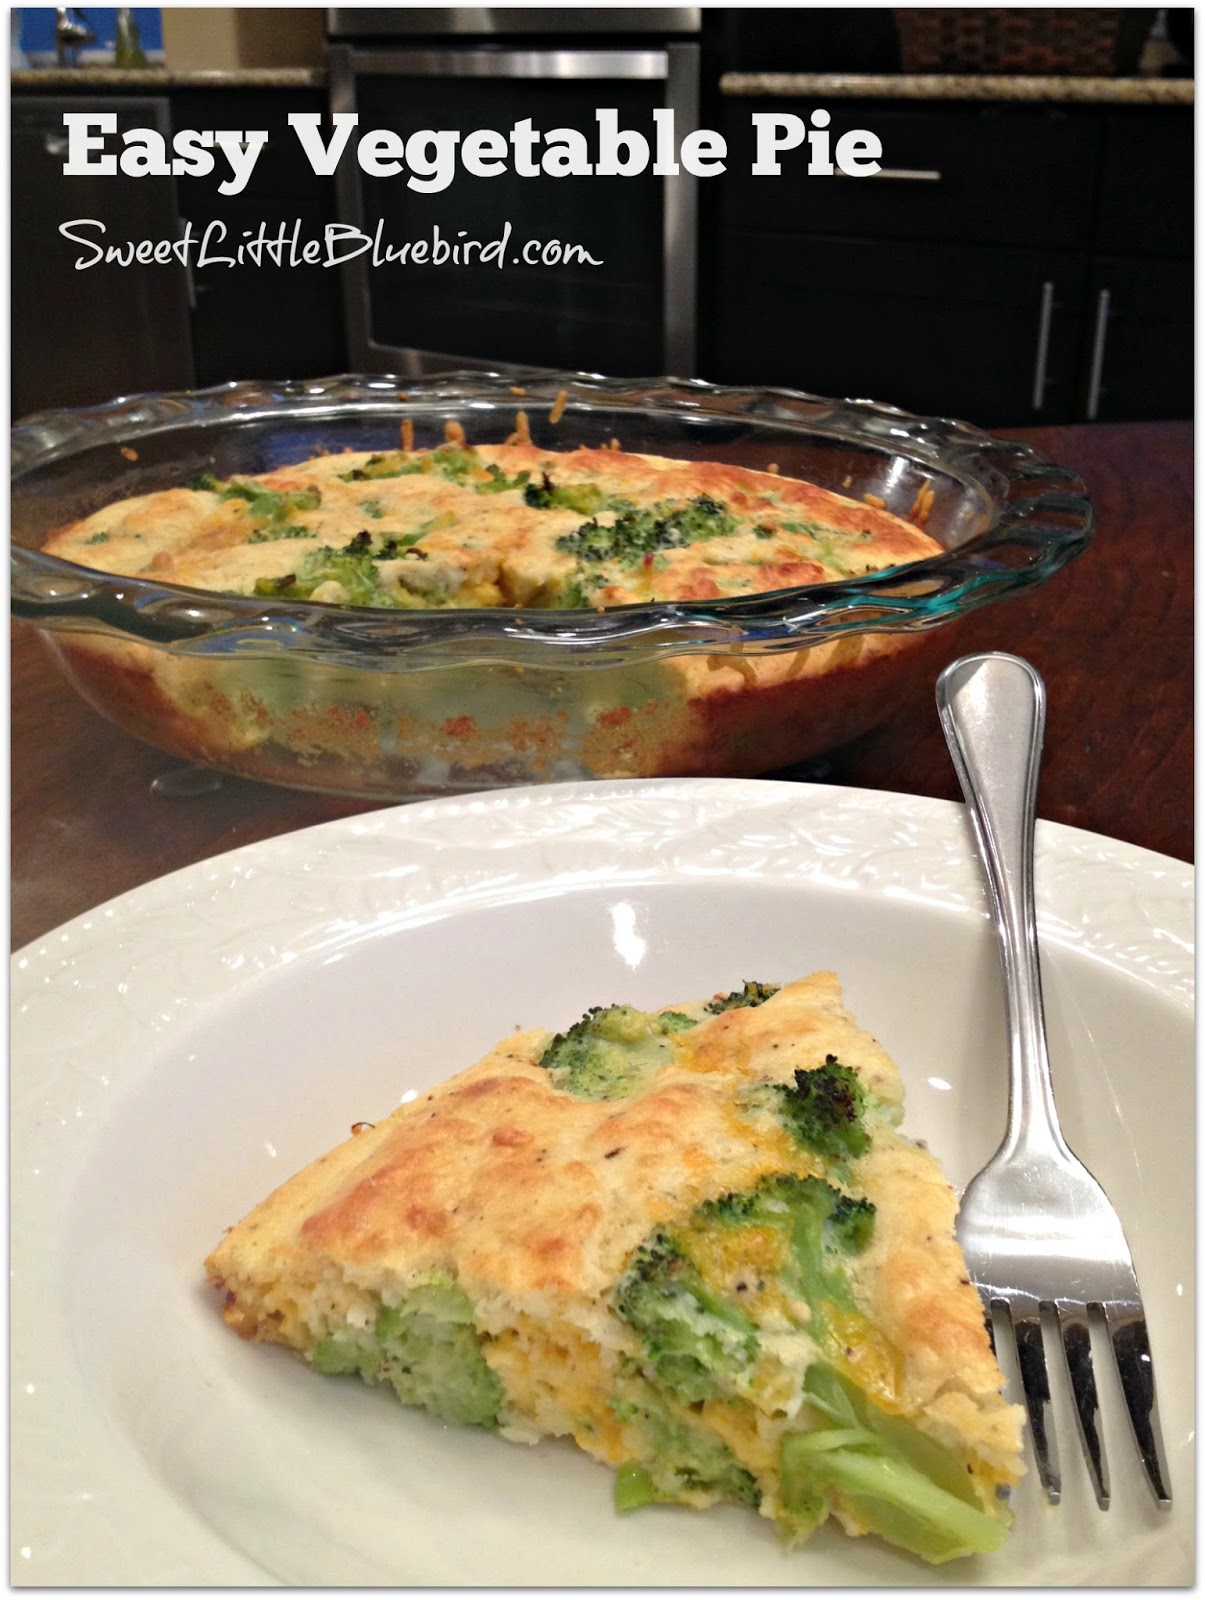 Sweet Little Bluebird: Easy Vegetable Pie